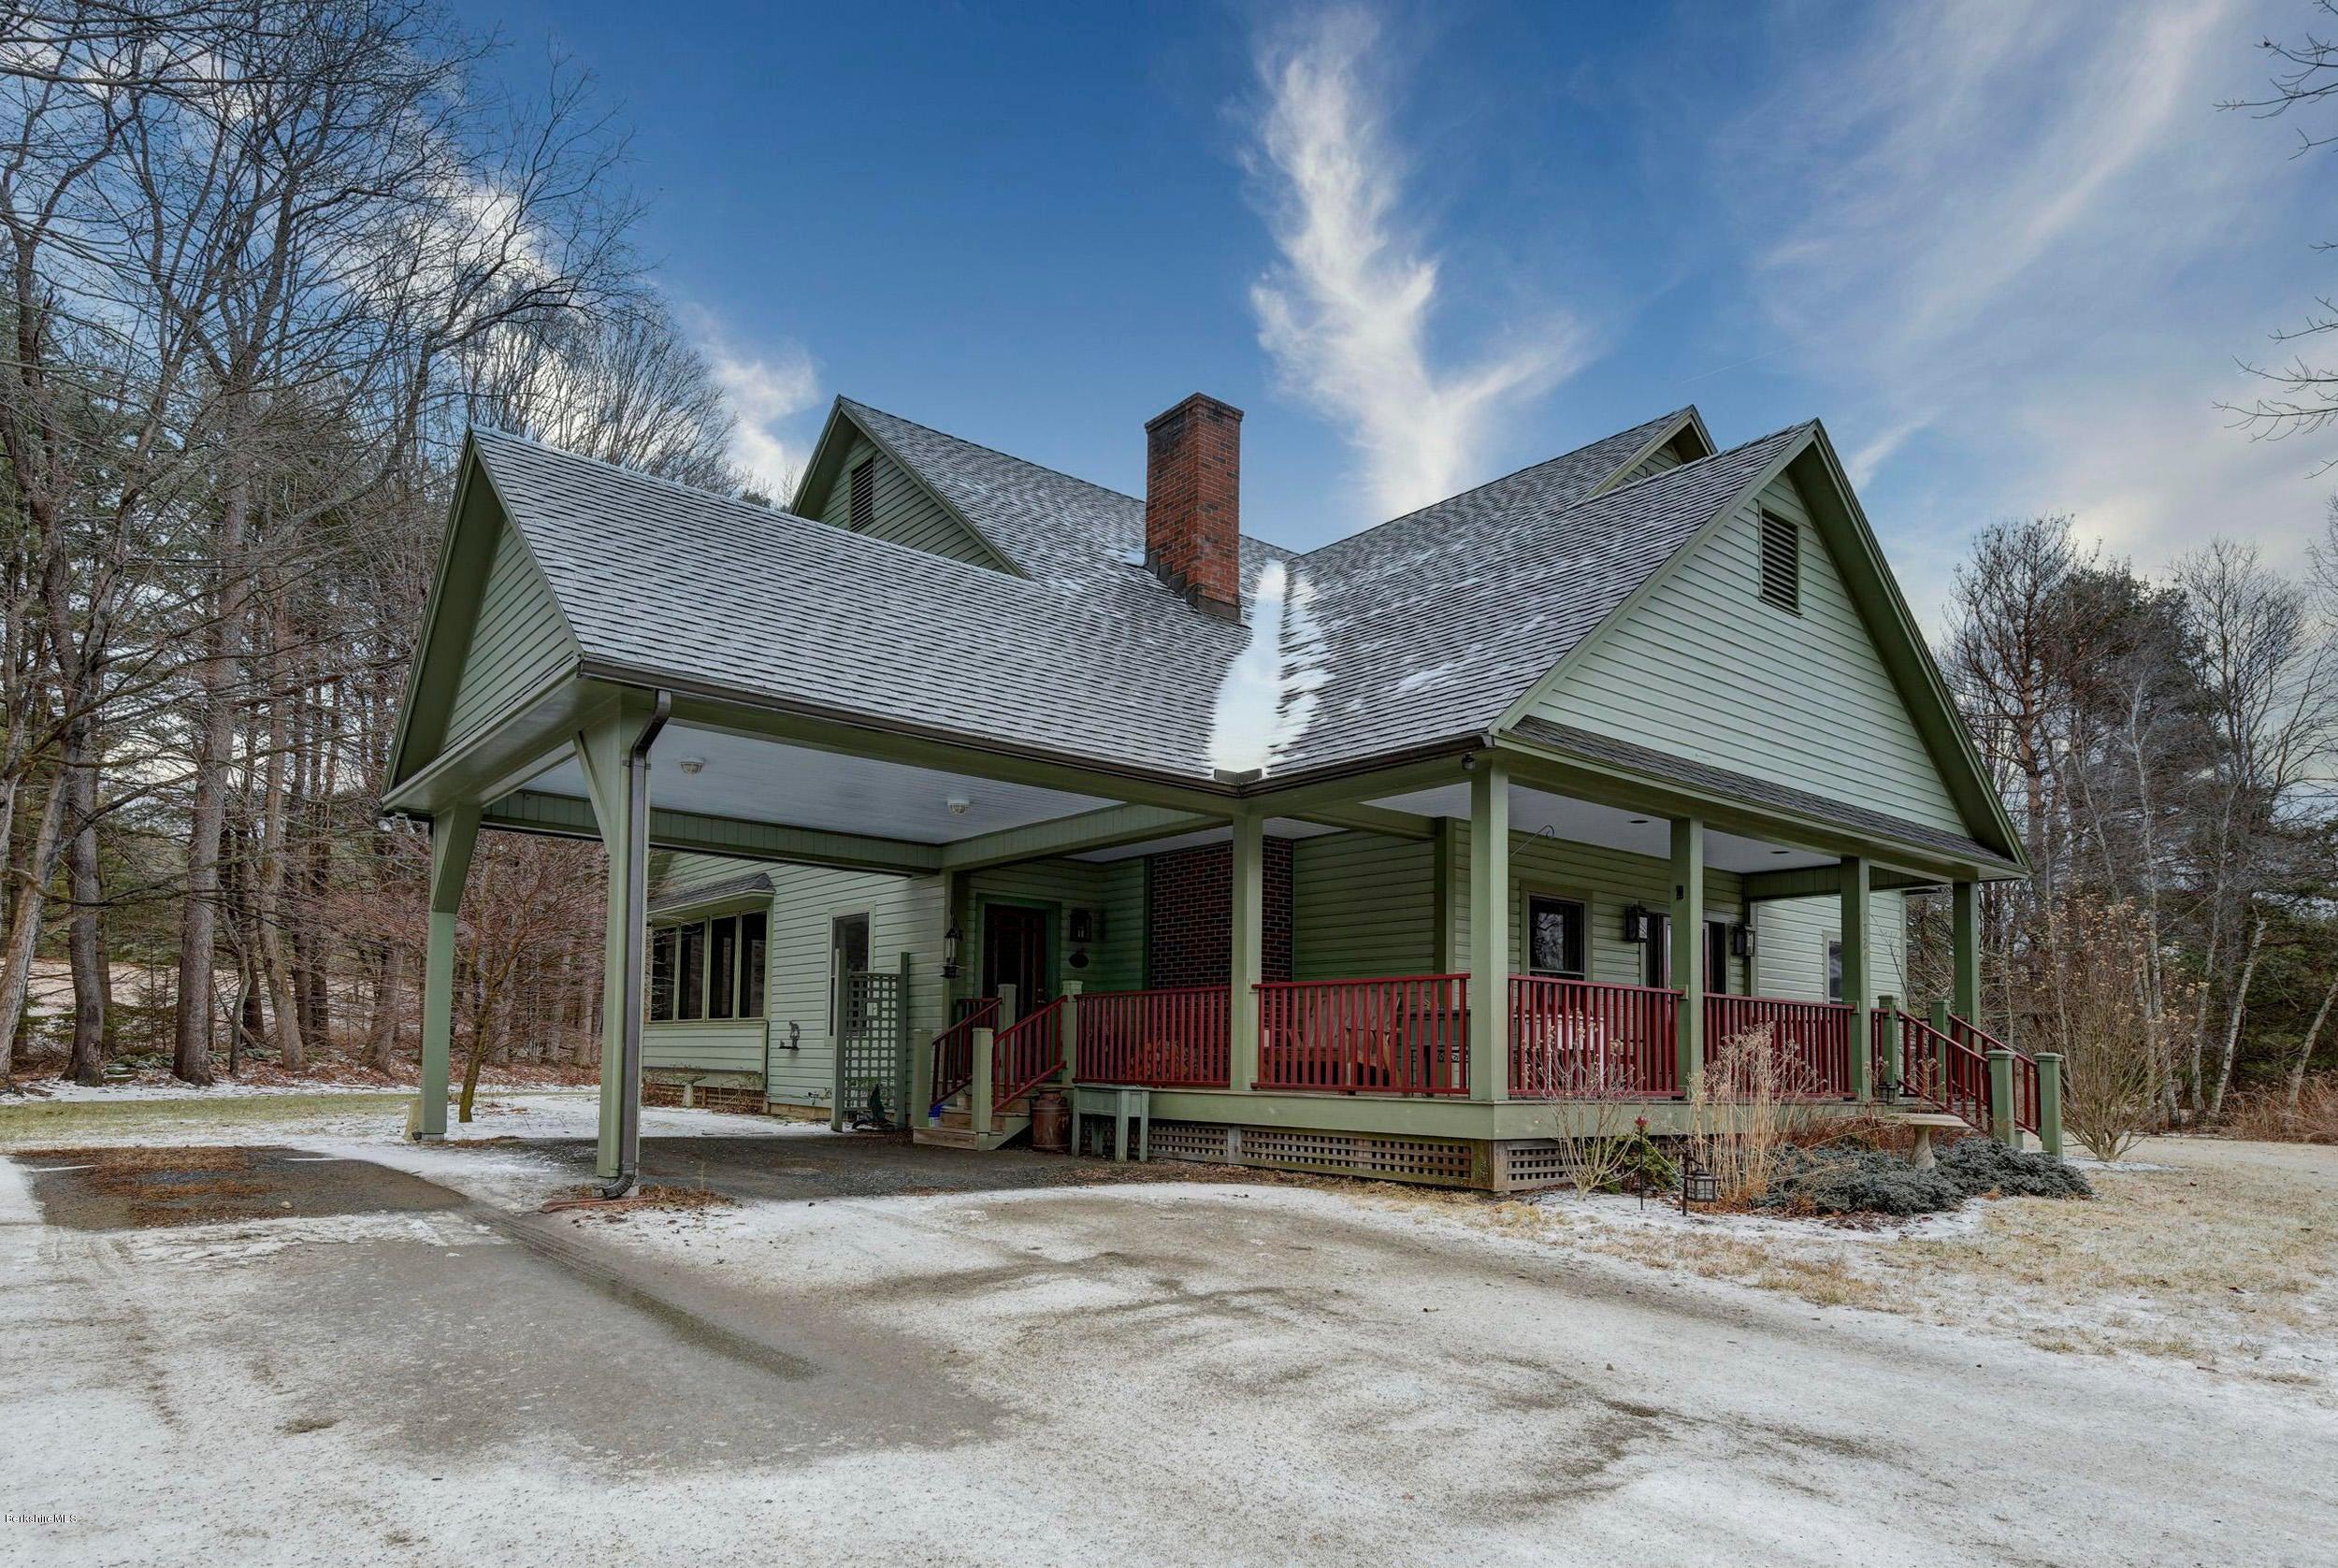 1724 Hartsville New Marlboro Rd, New Marlborough, MA 01230